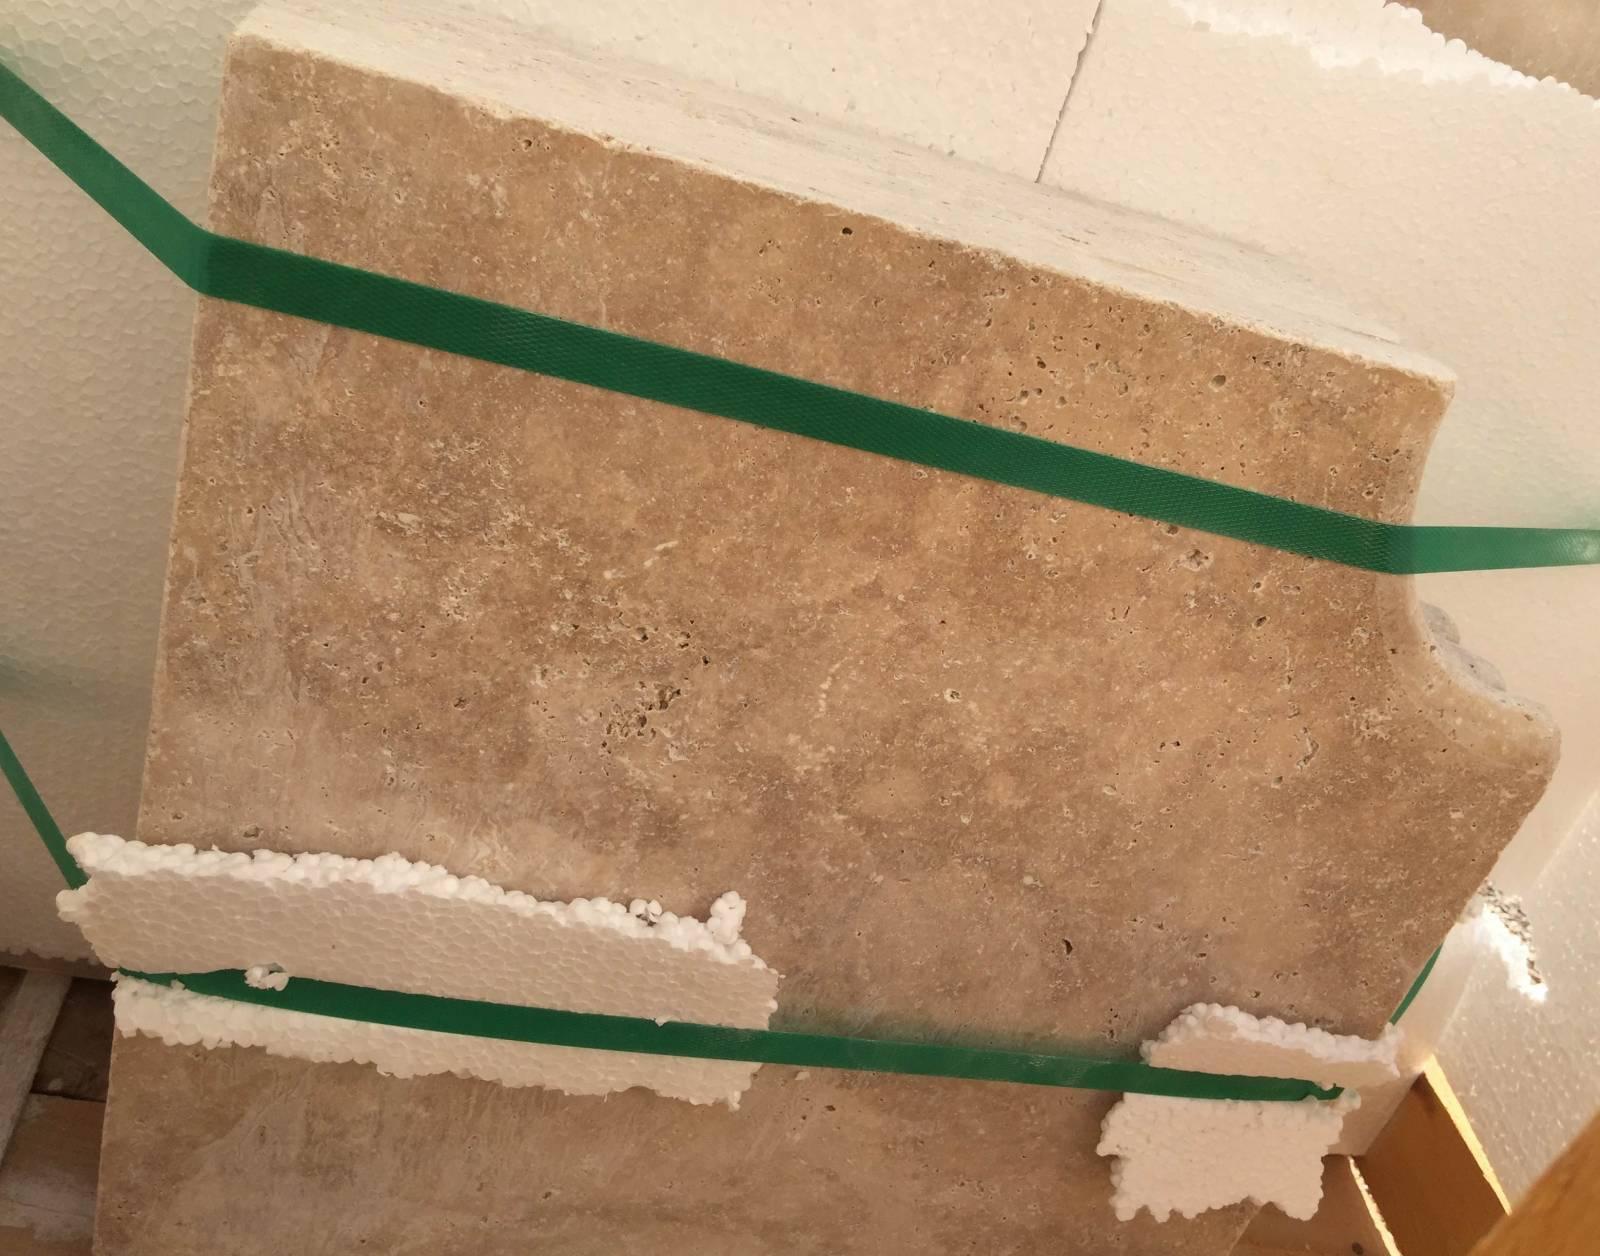 Travertin avignon 84 vaucluse taille et vente de pierres naturelles pr s de montpellier - Piscine mosaique verte avignon ...